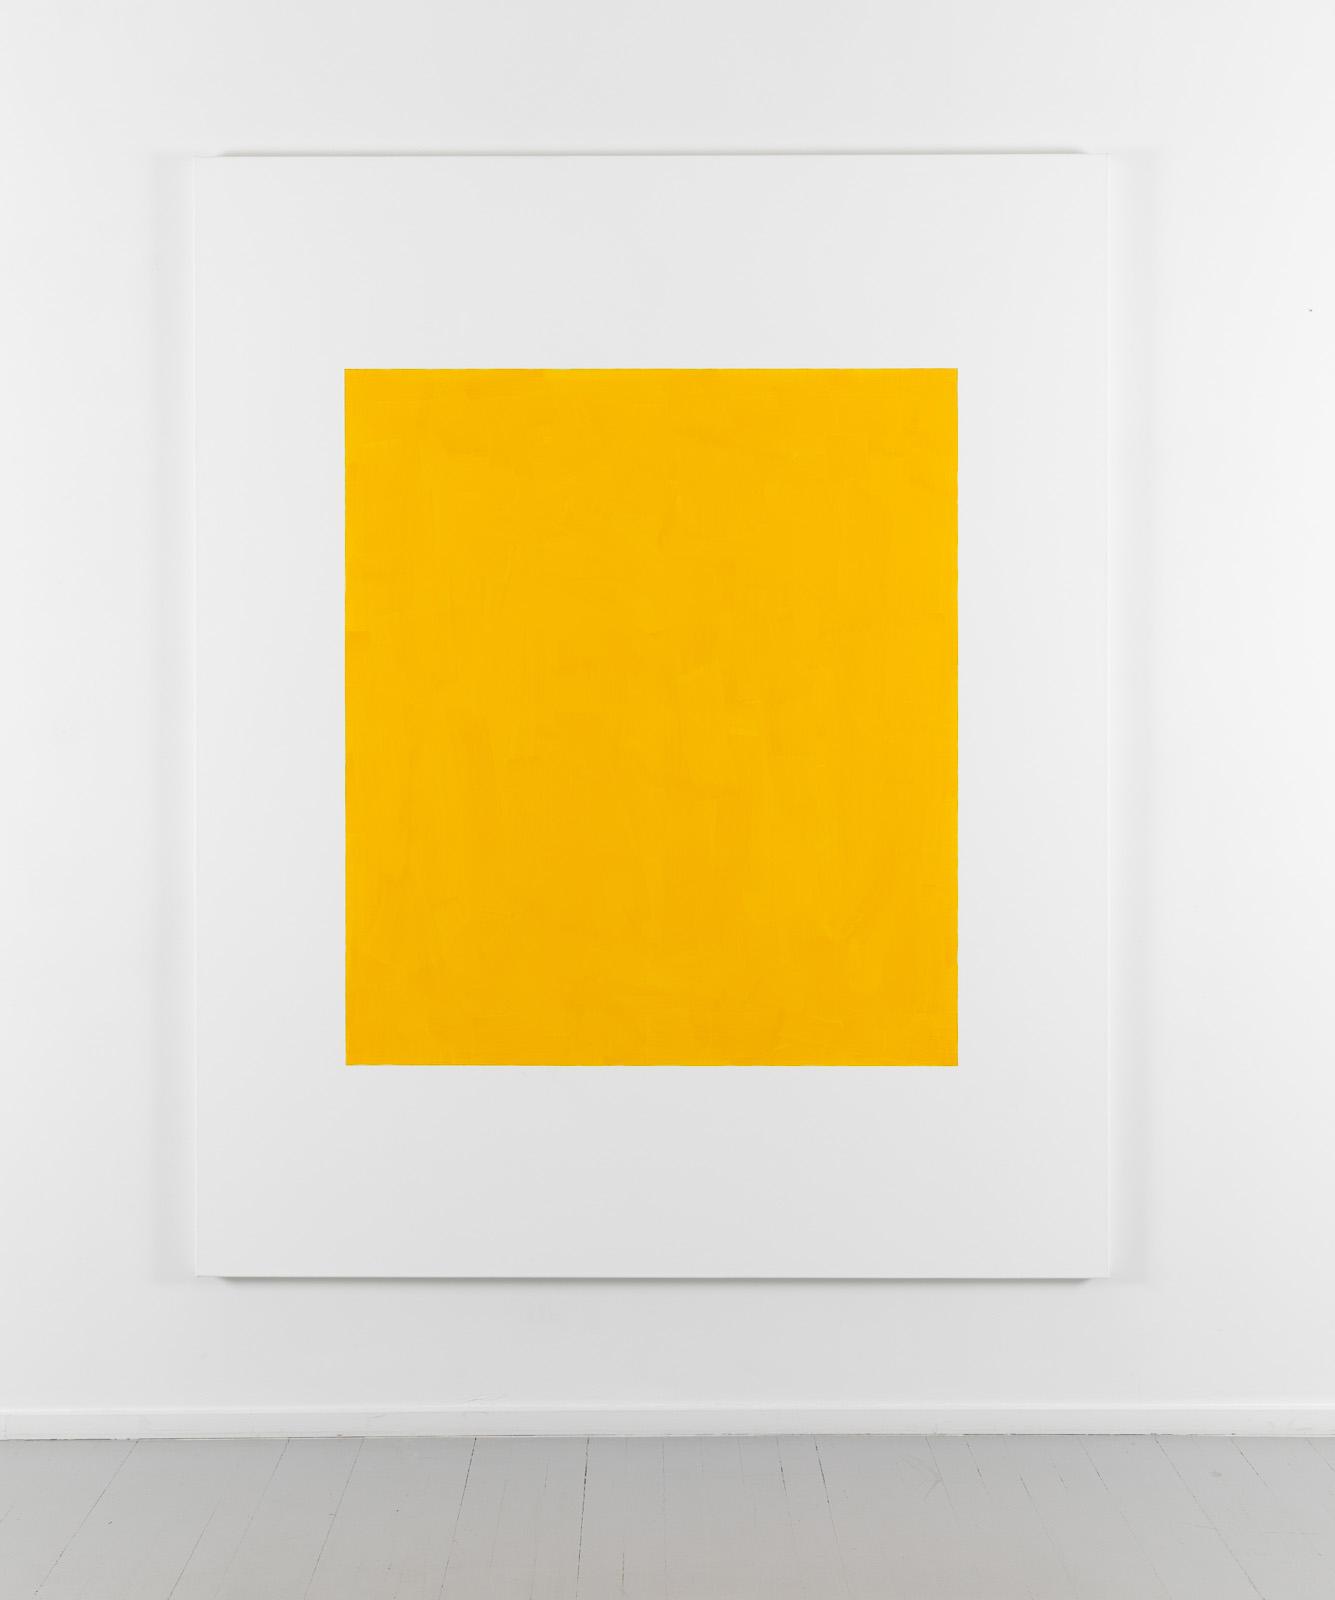 Untitled - kadmiumgul middels, 2001, Acrylic and oil on canvas, 200 x 163 cm